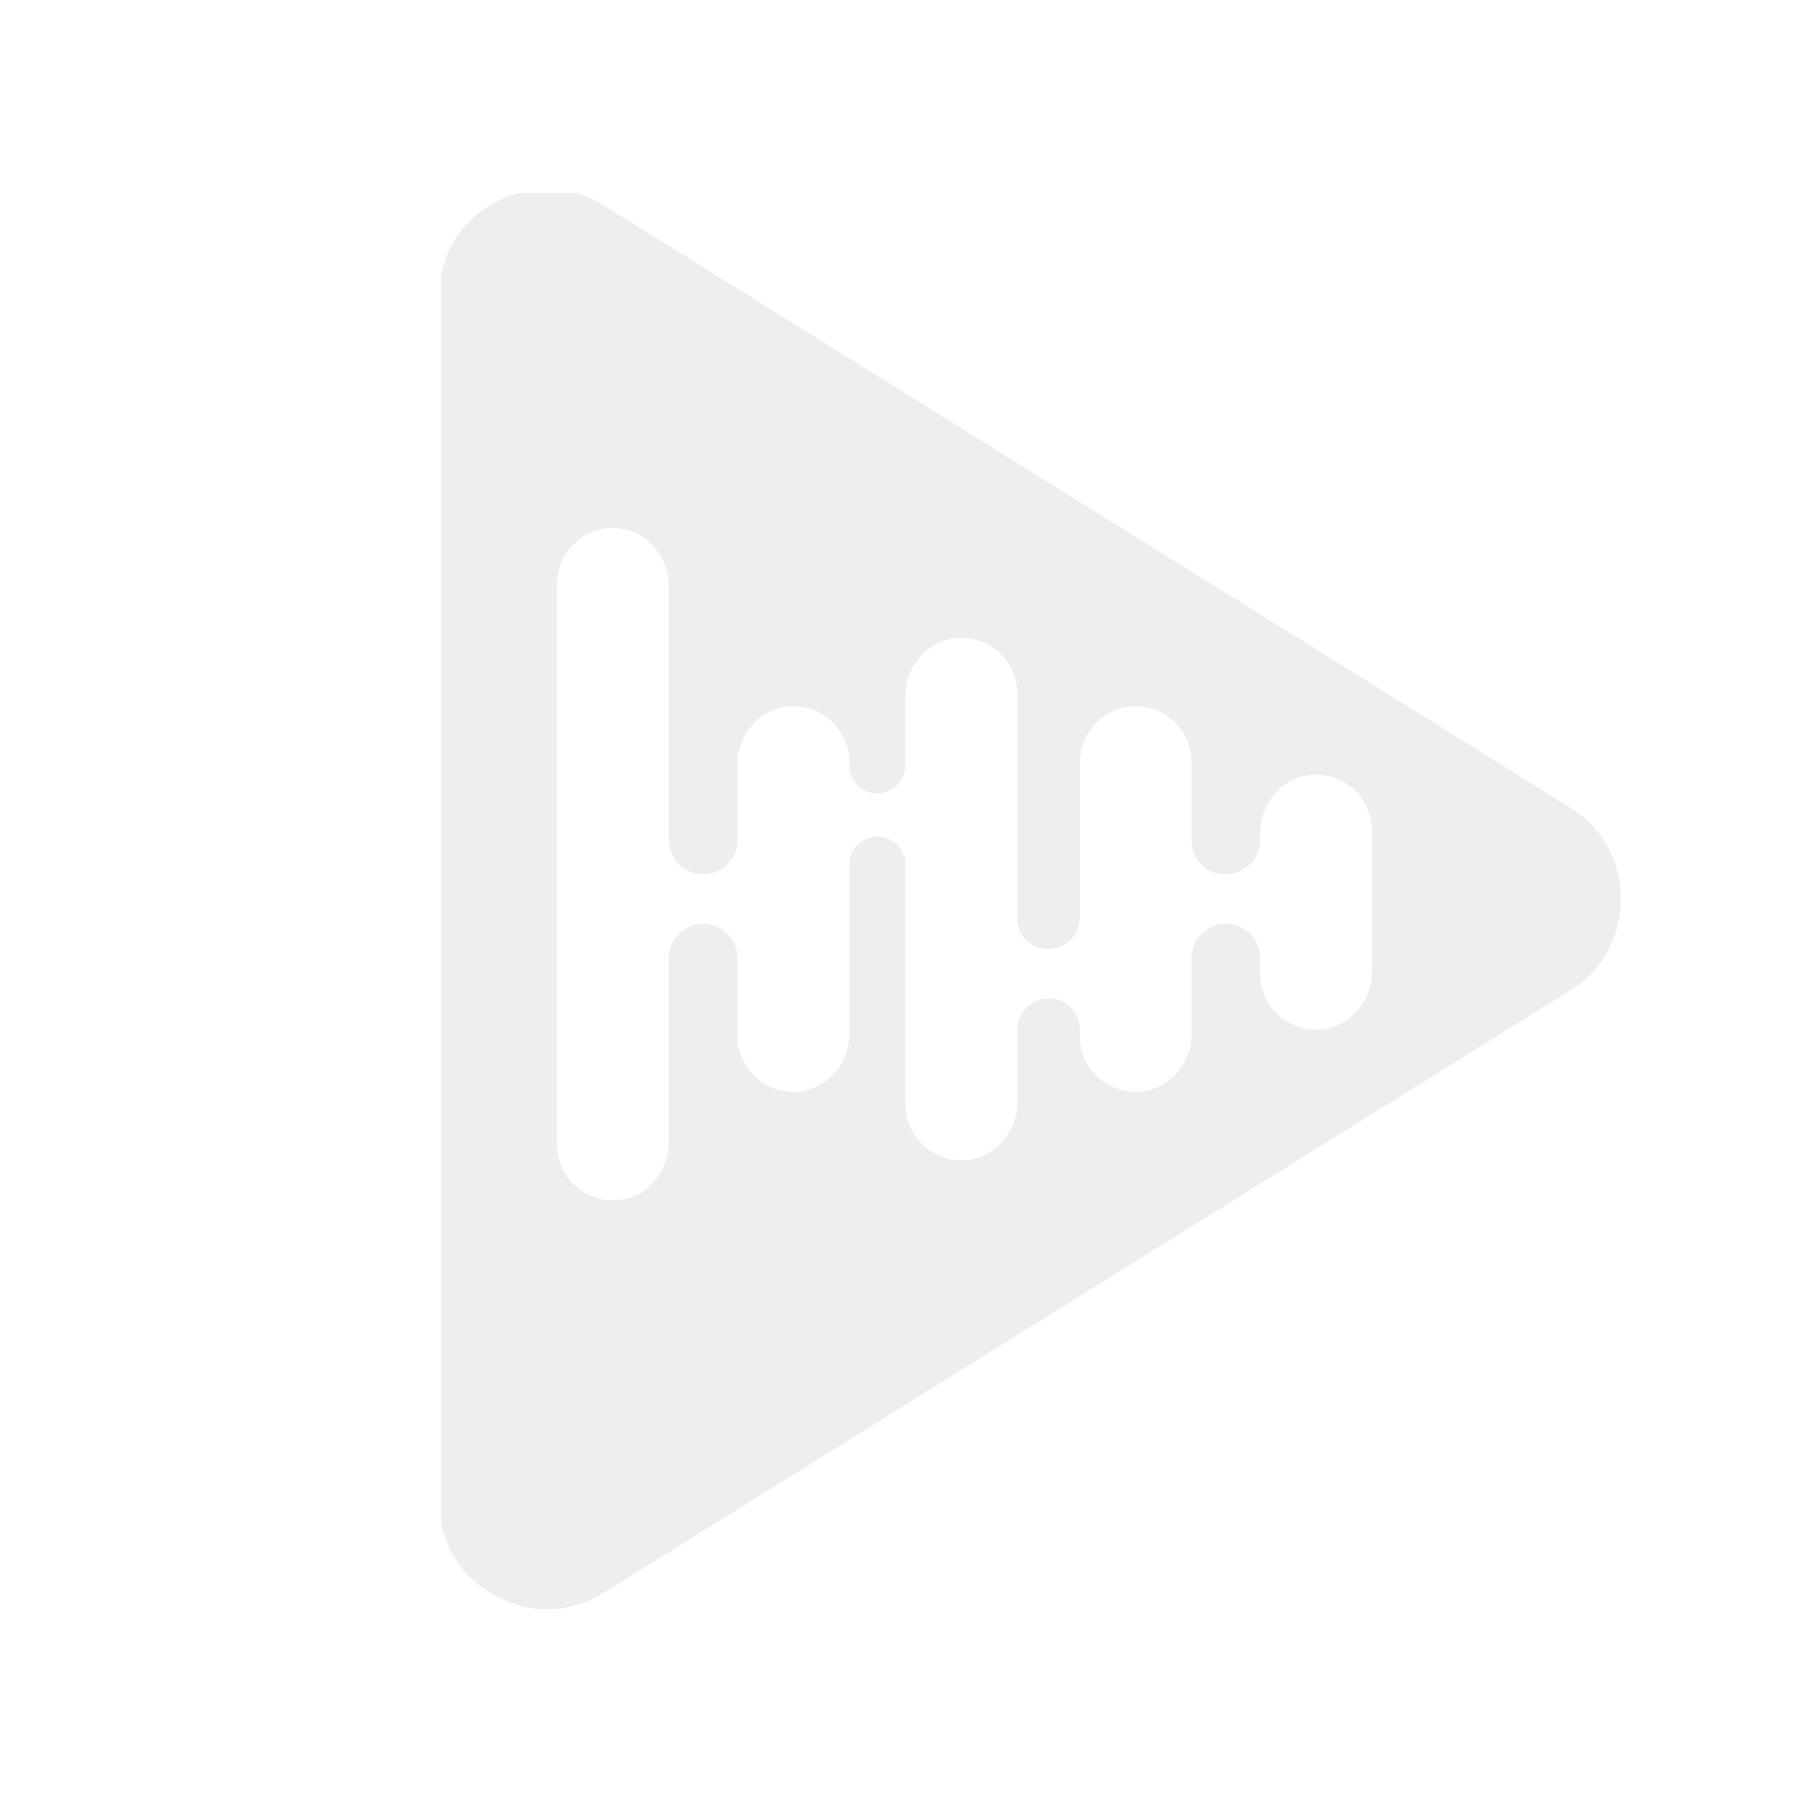 Phonocar VM273 - Biltilpasset ryggekamera